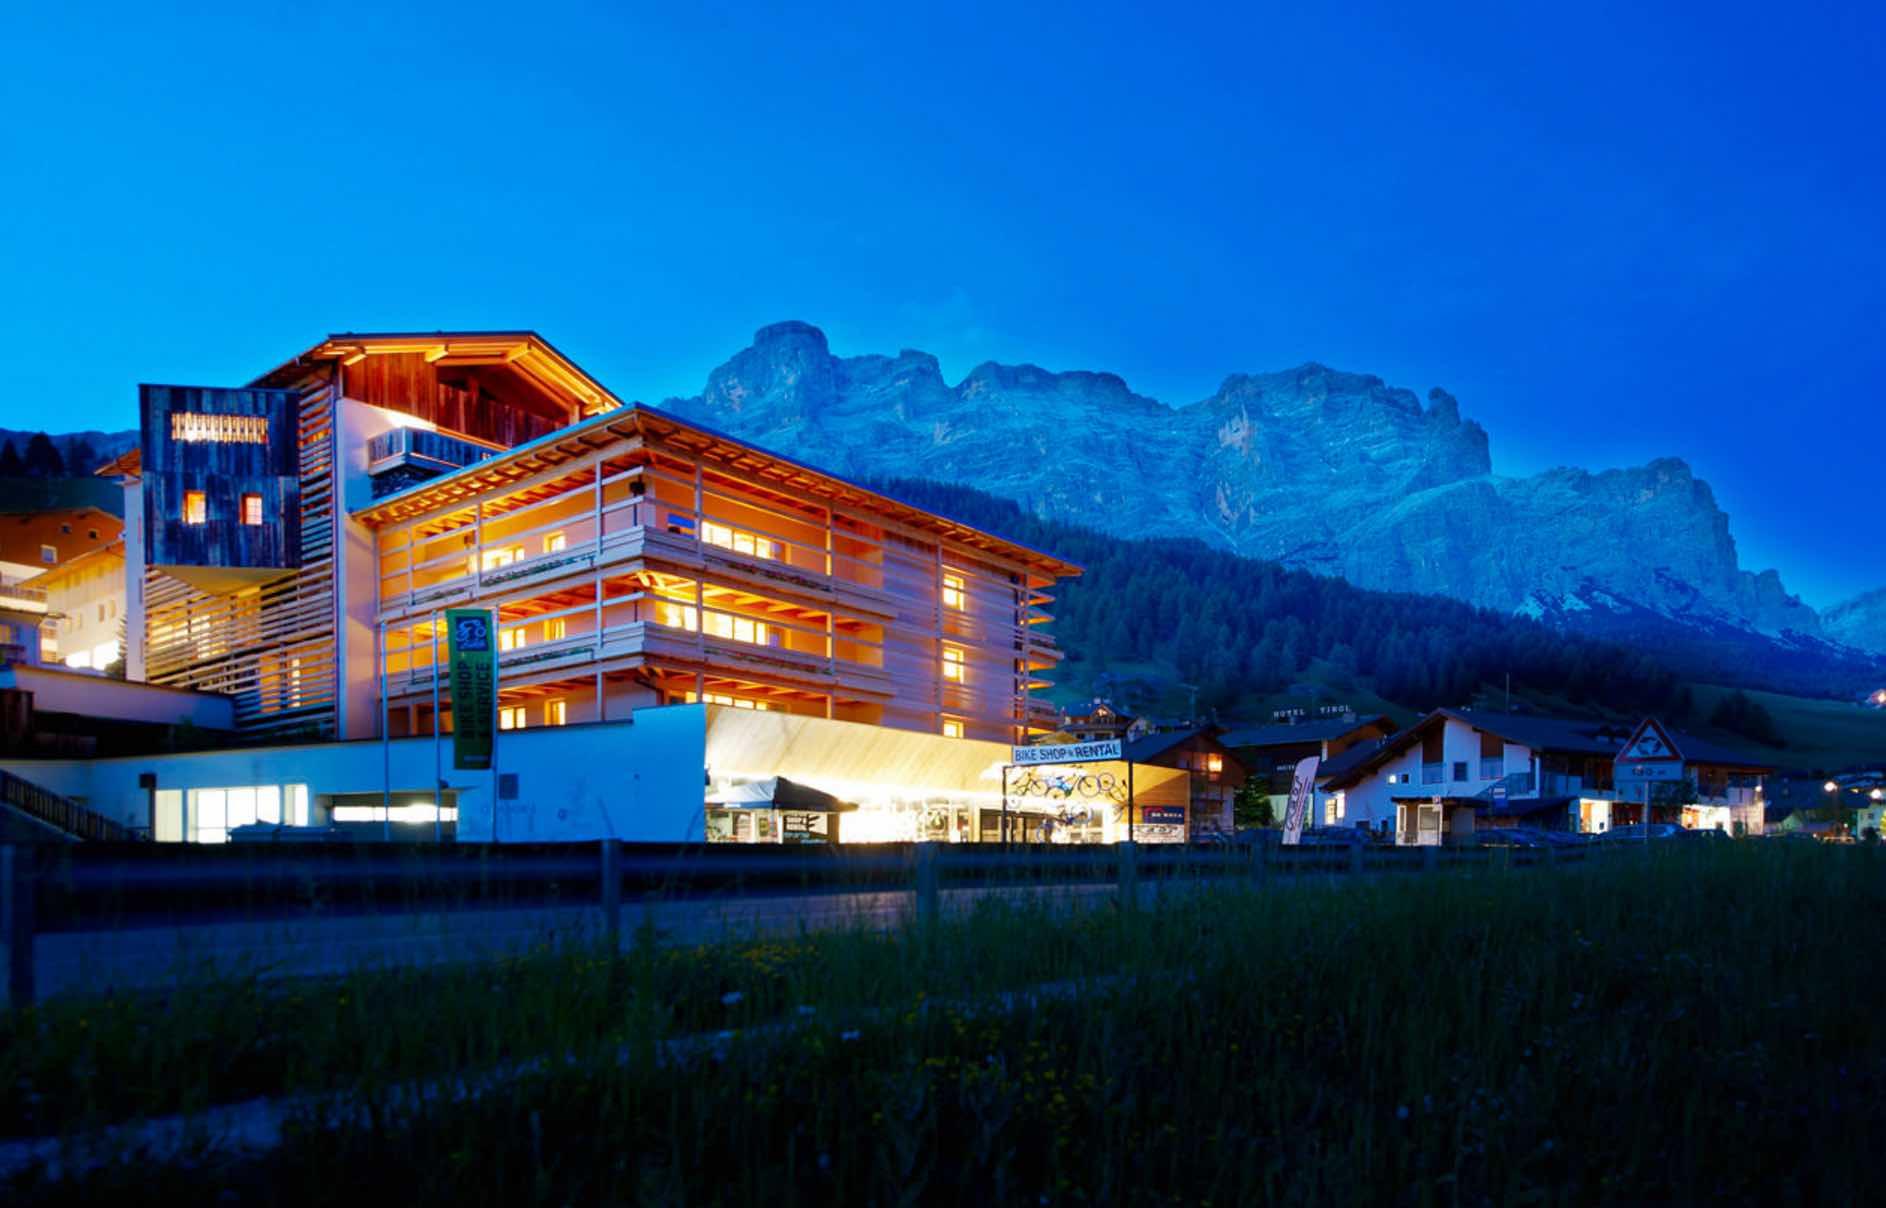 Lagació Mountain Residence - Hotels Dolomites Italy 1.jpg